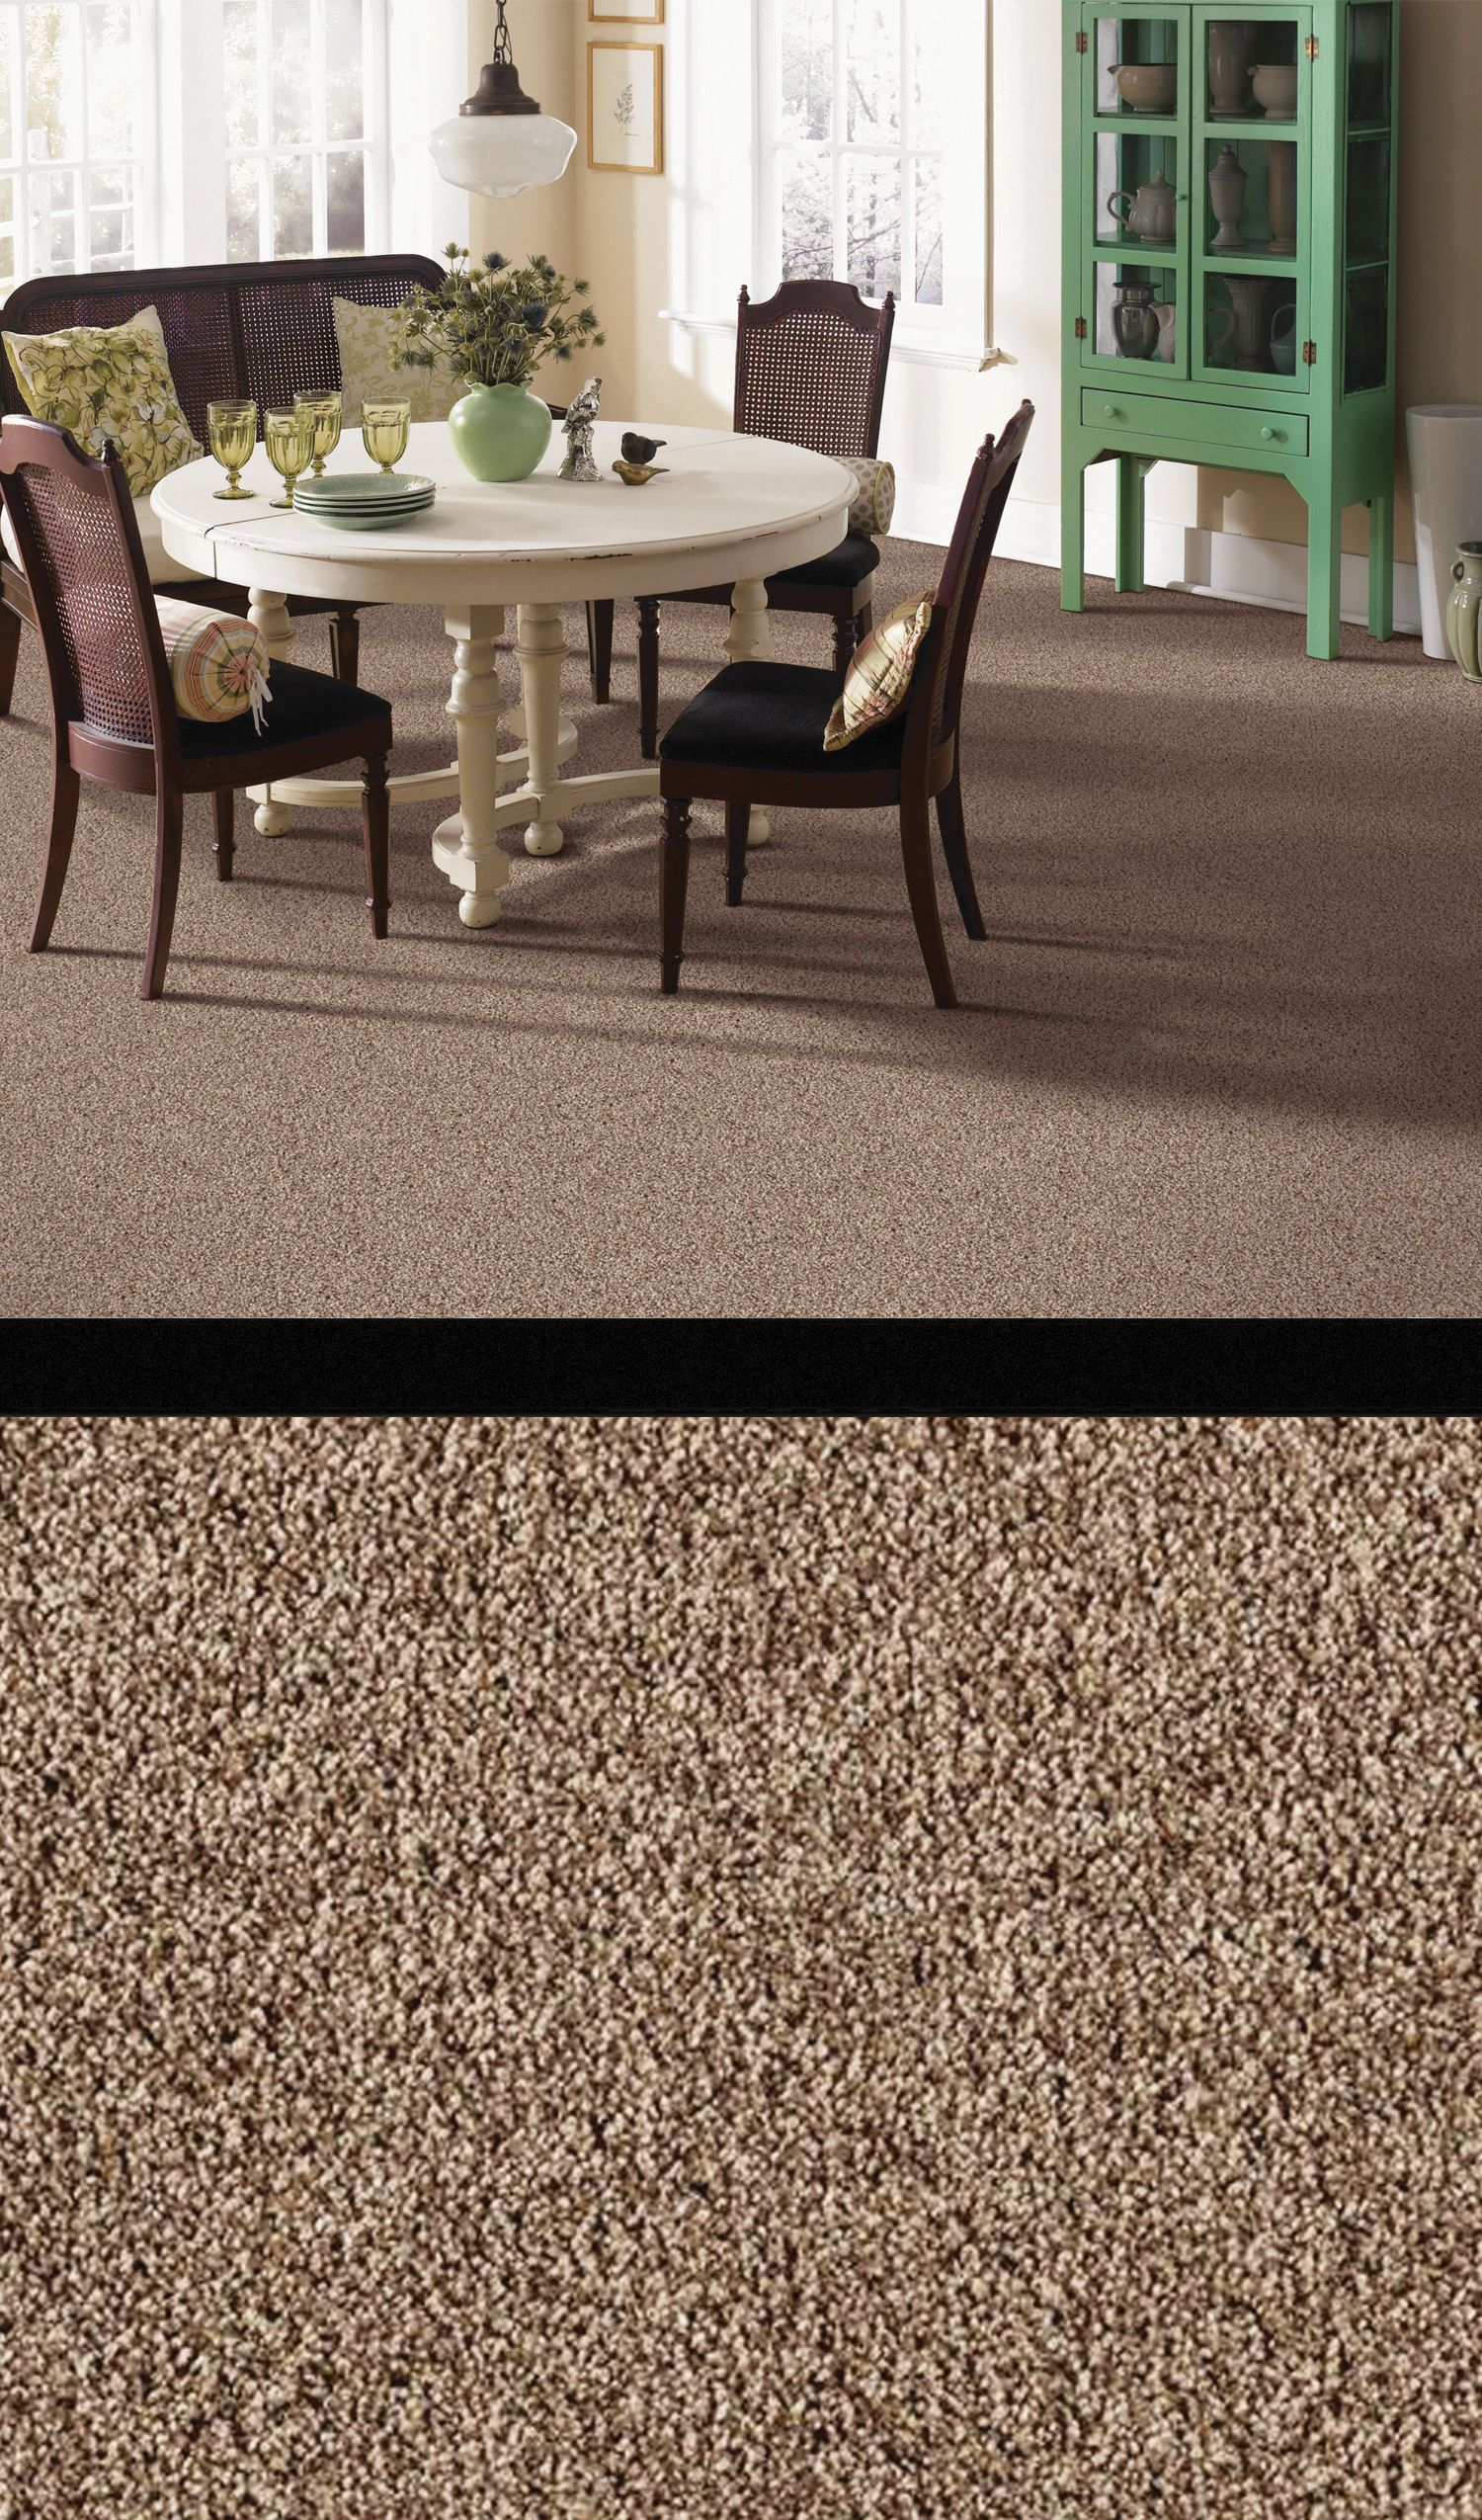 Mohawk Copper Village Carpet 12 Ft Wide At Menards Carpet Sale Carpet Axminster Carpets